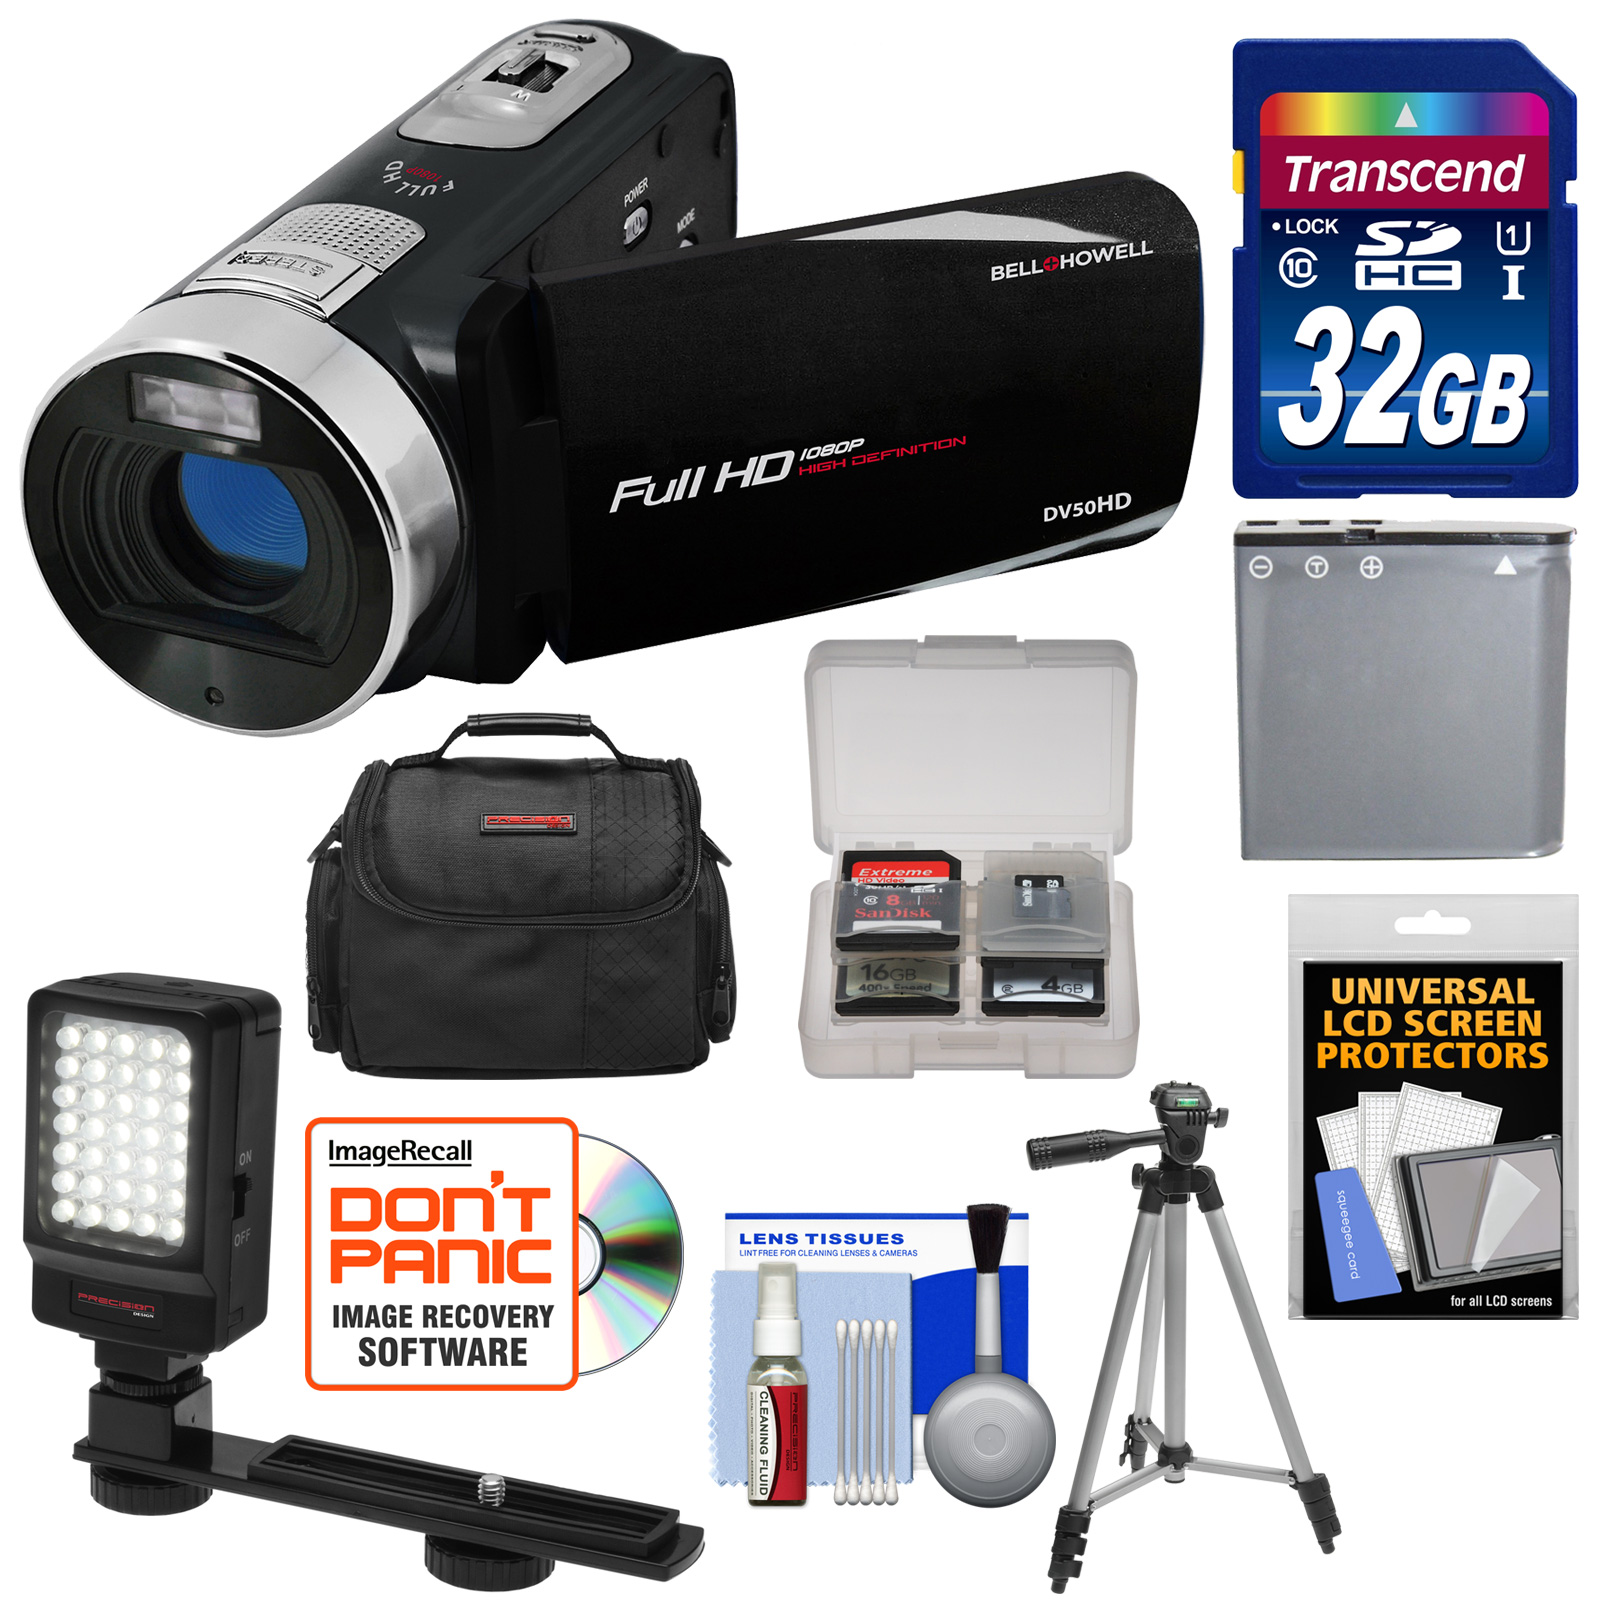 Bell & Howell Fun Flix DV50HD 1080p HD Video Camera Camcorder (Black) with 32GB Card + Battery + Case + Tripod + LED Video Light + Kit